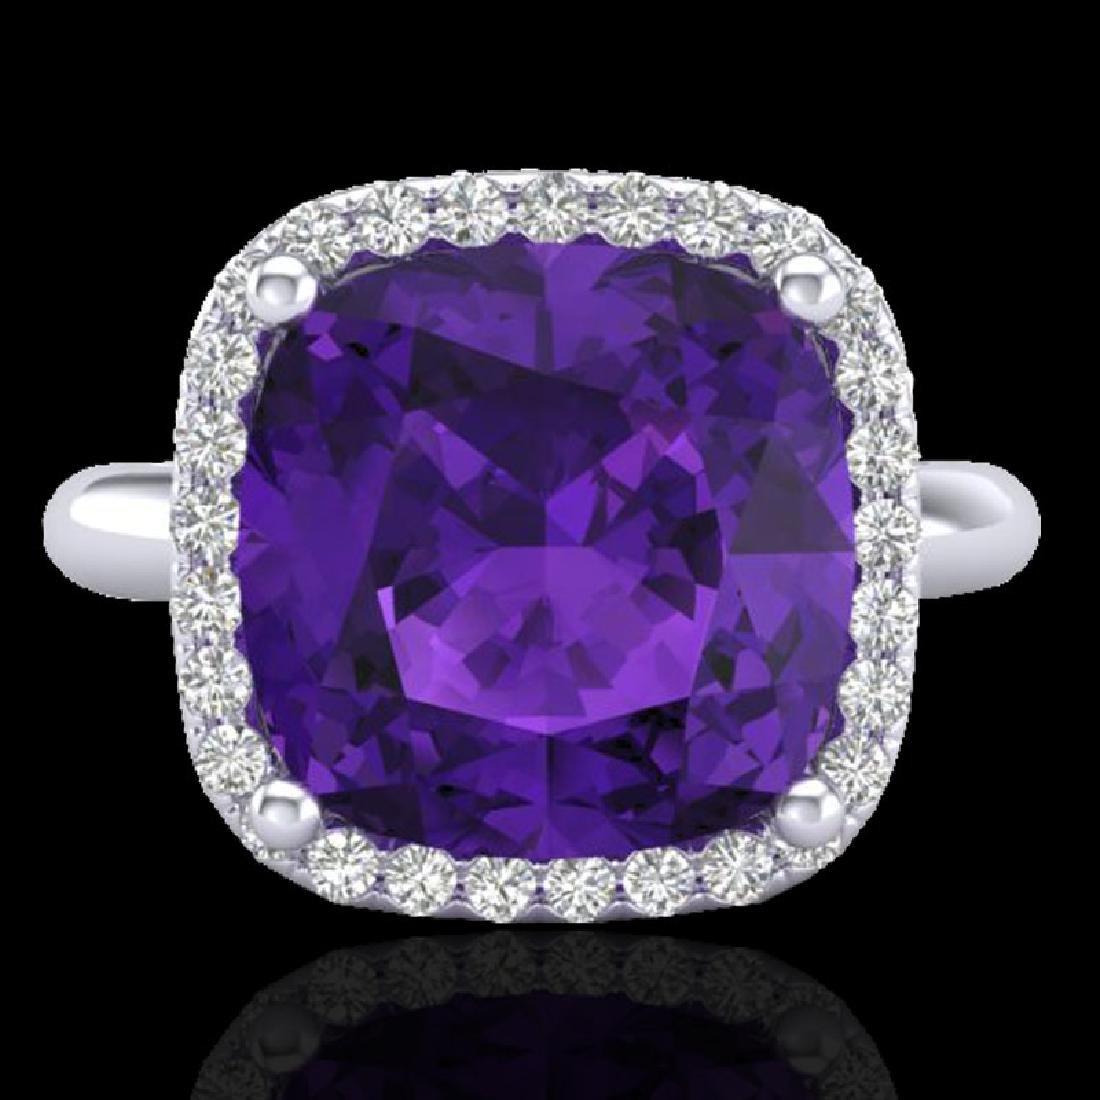 6 CTW Amethyst & Micro Pave Halo VS/SI Diamond Ring